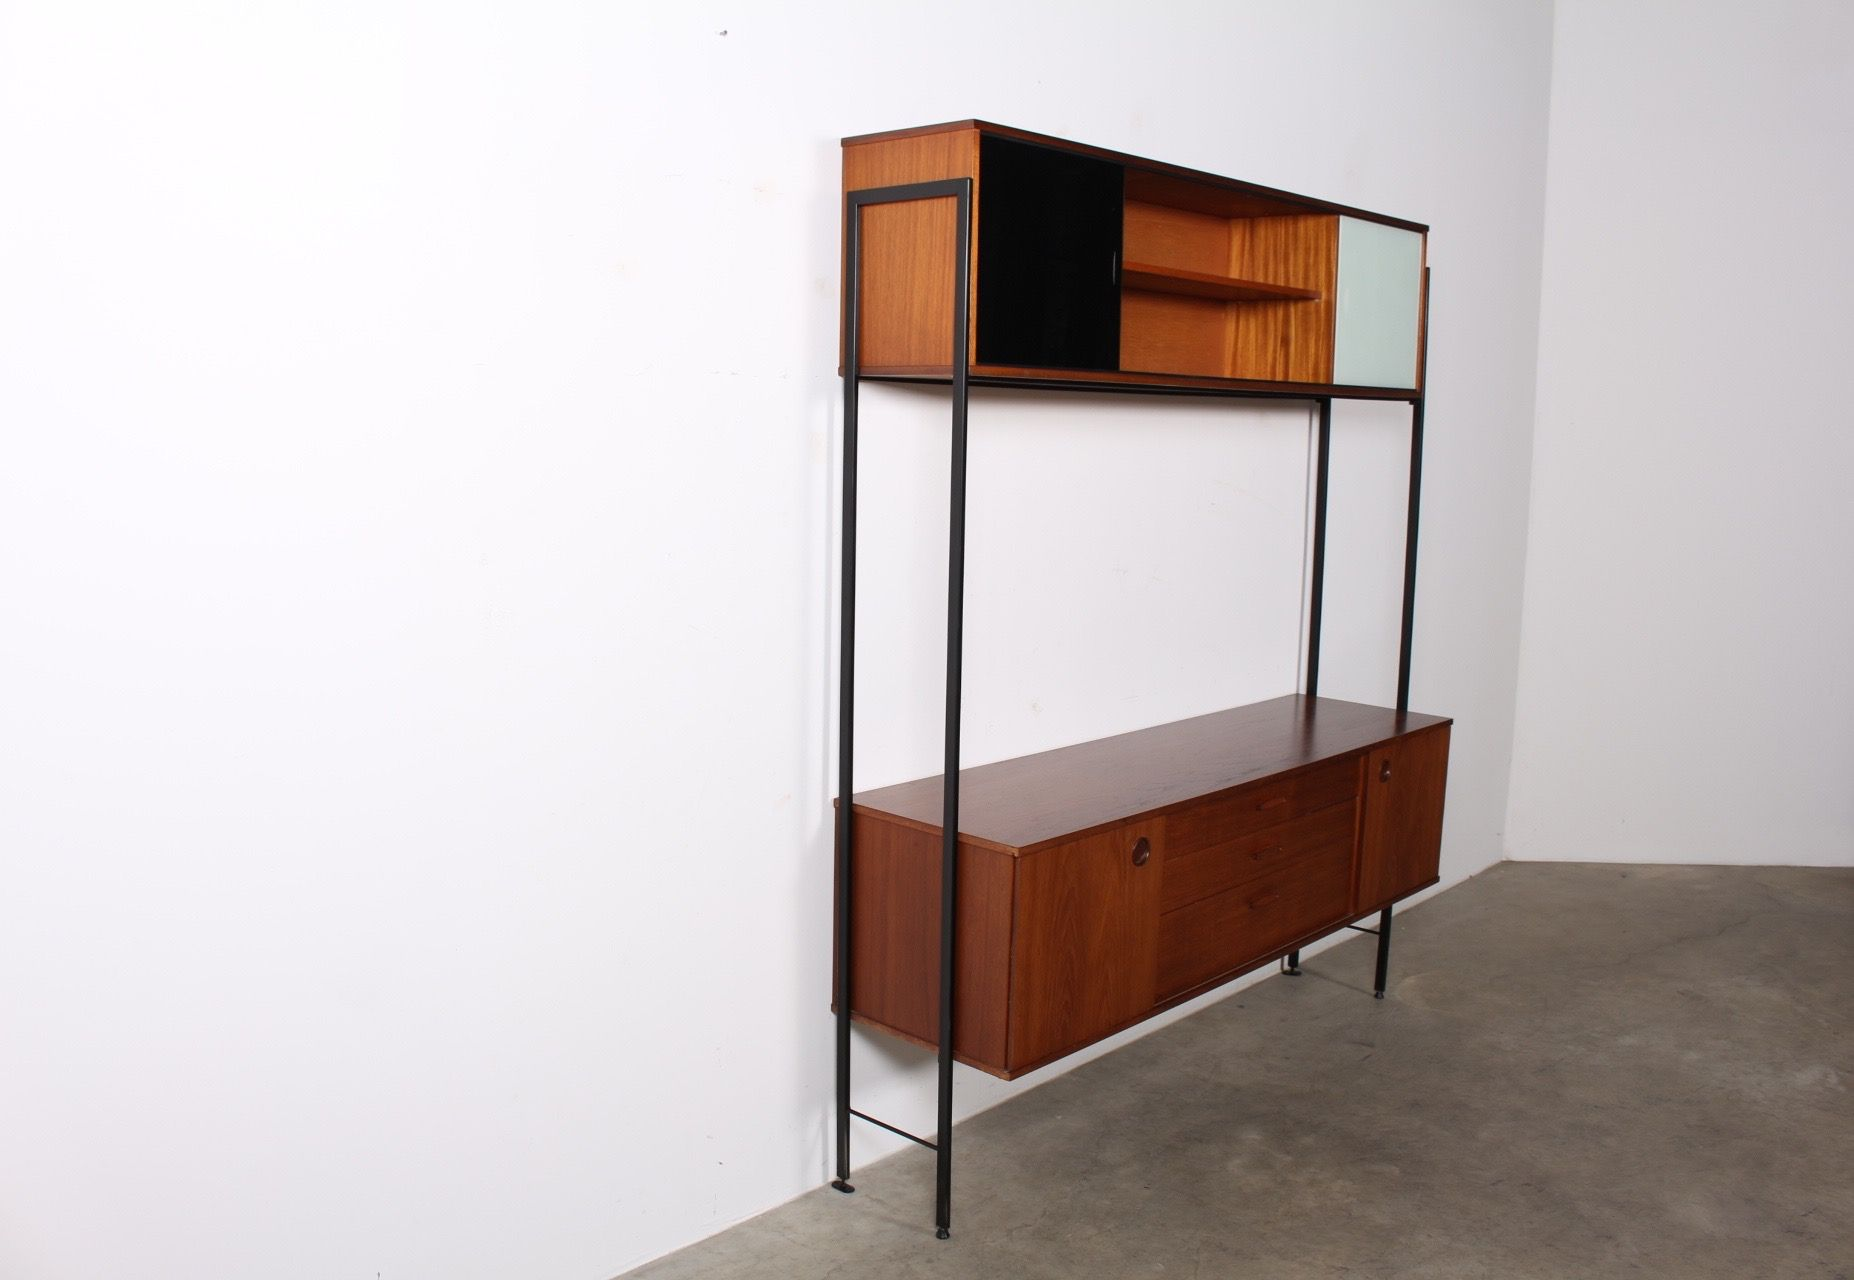 Sideboard Buffet Enfilade Meuble Vintage Design Scandinave Danemark A Liege